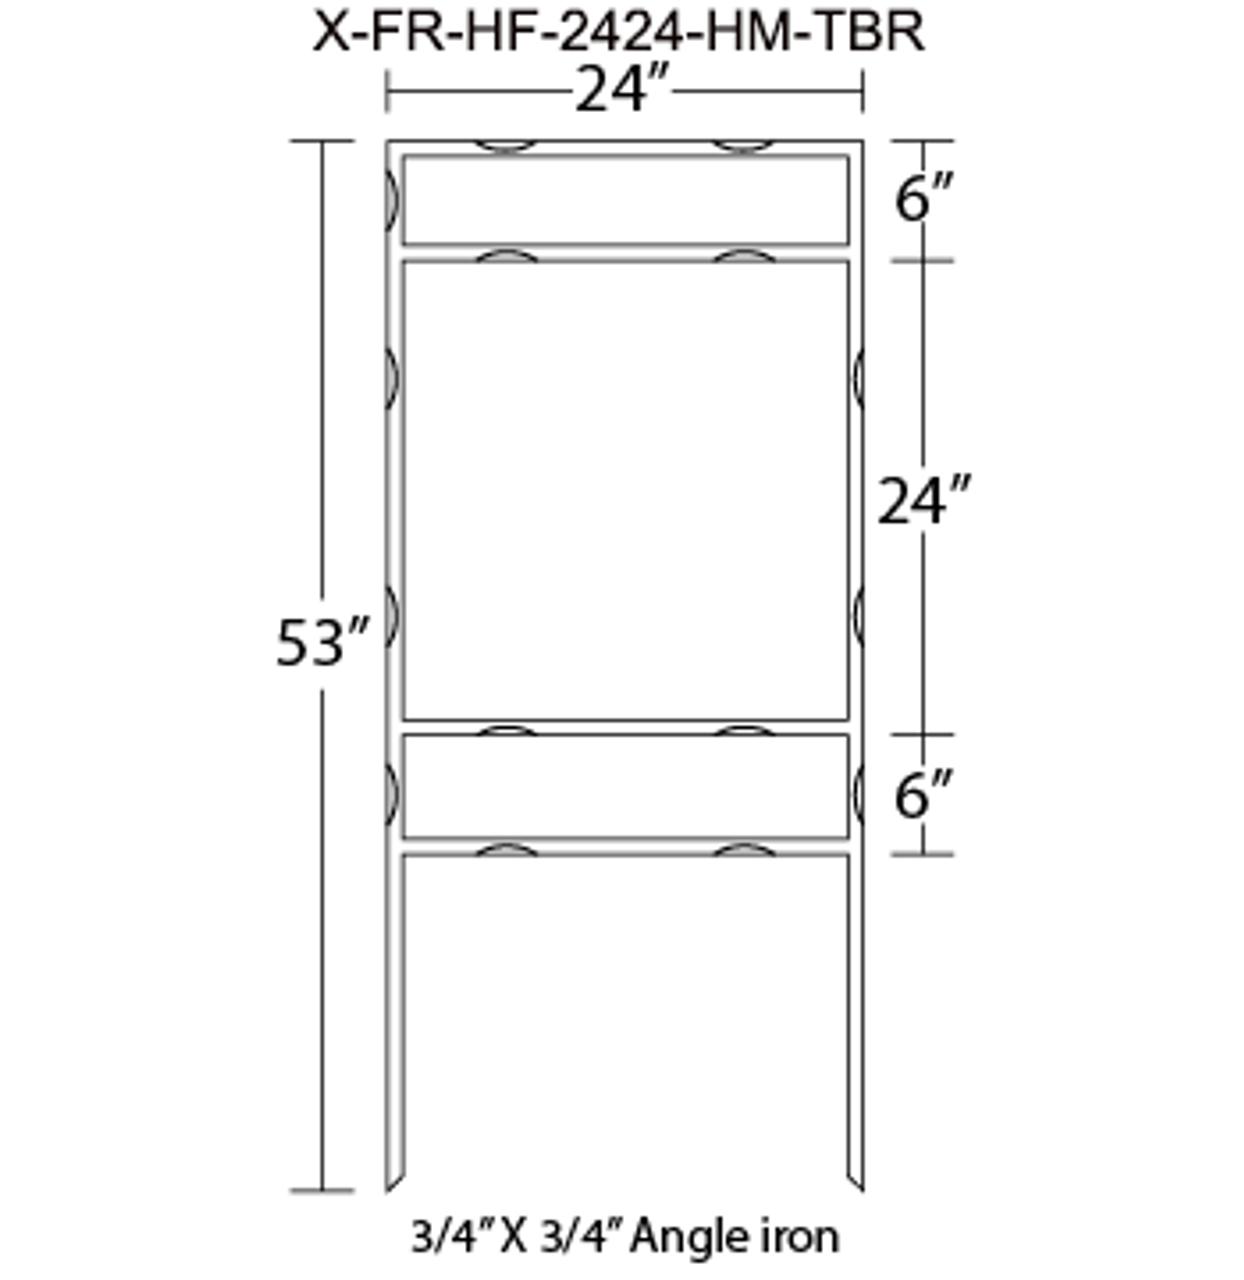 X-FR-HF-2424-HM-TBR